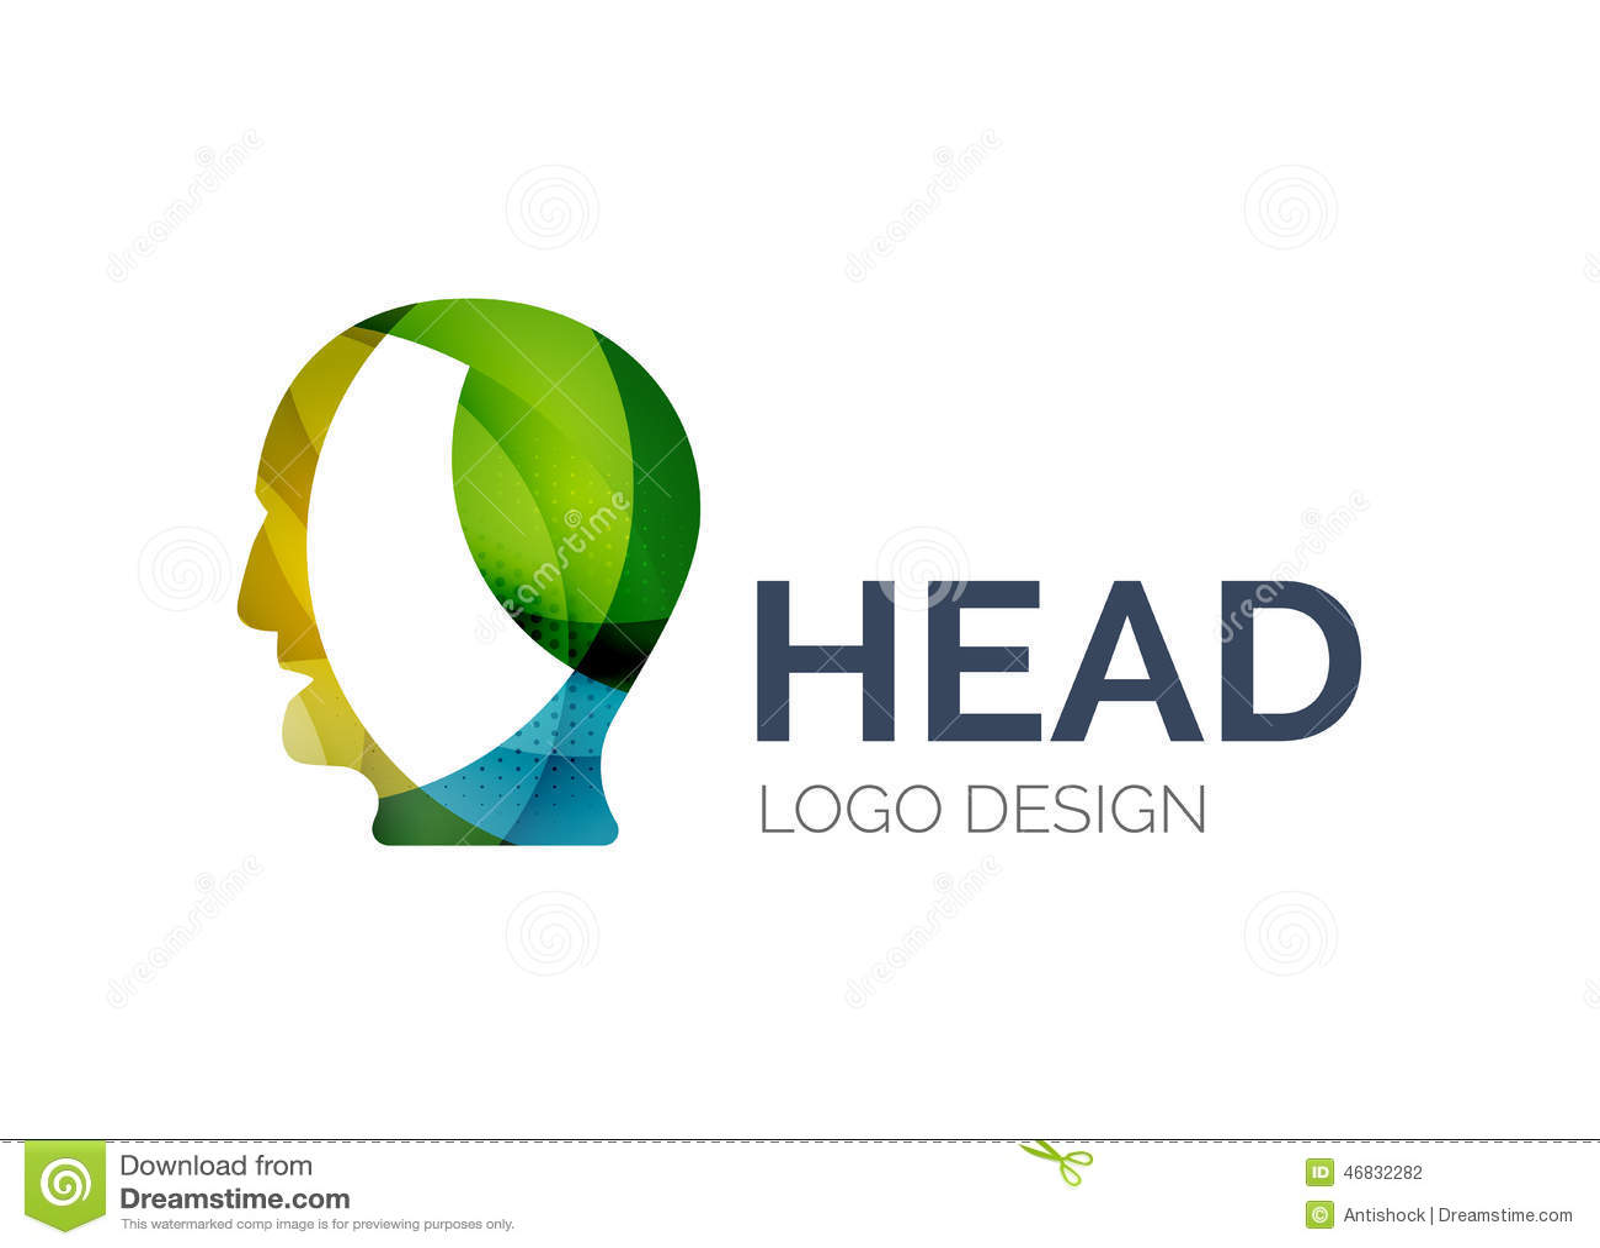 Human Head Logo Design Made Of Color Pieces Stock Vector